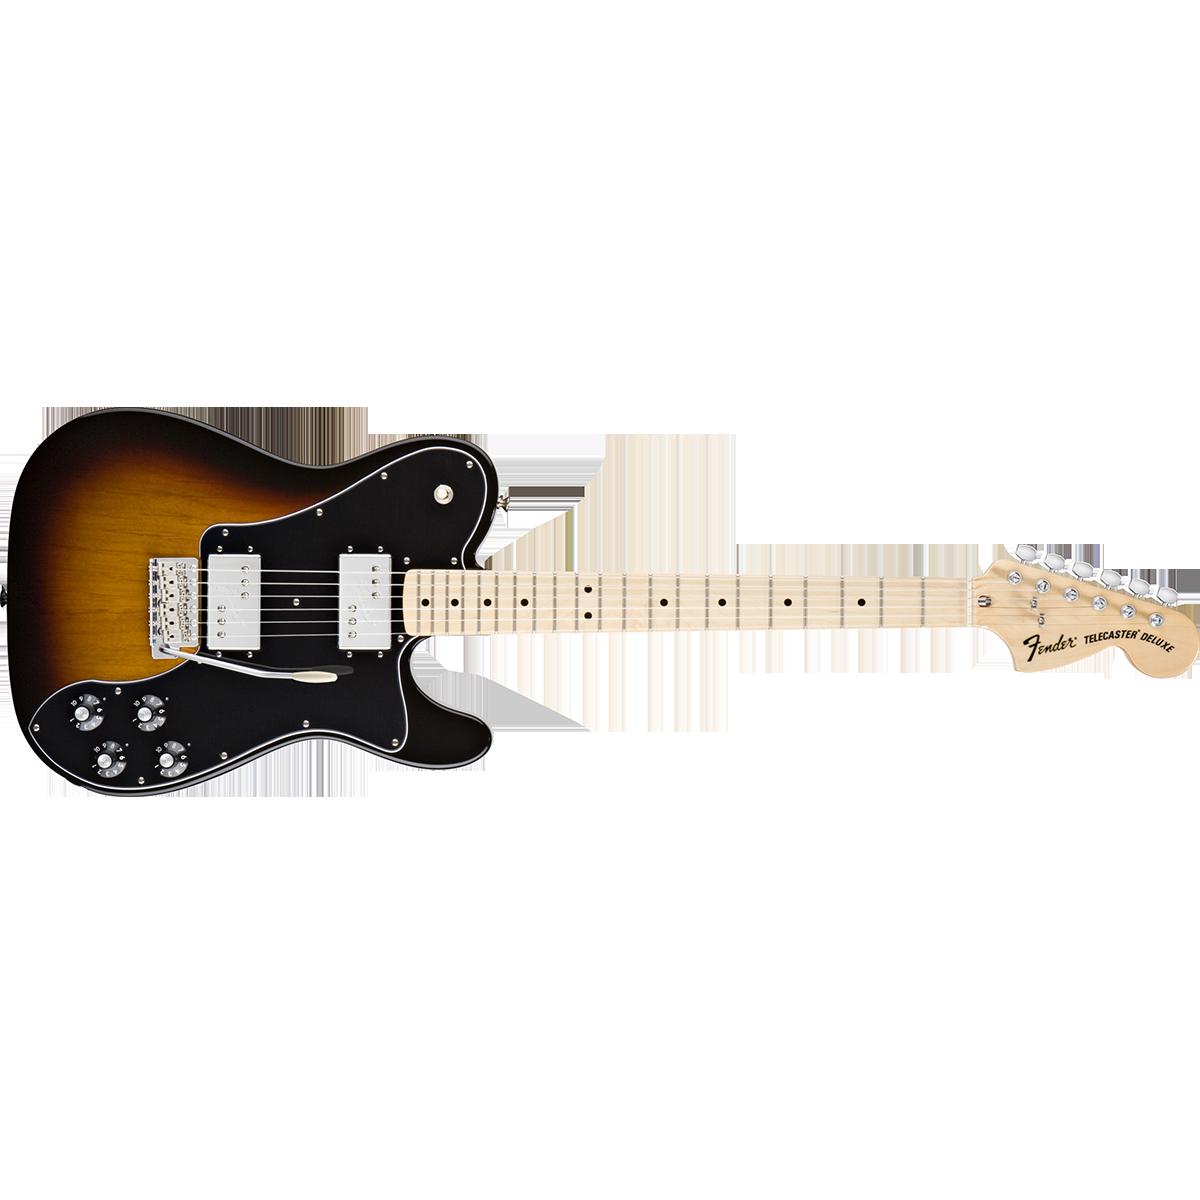 Fender Classic Player Telecaster Deluxe Tremolo